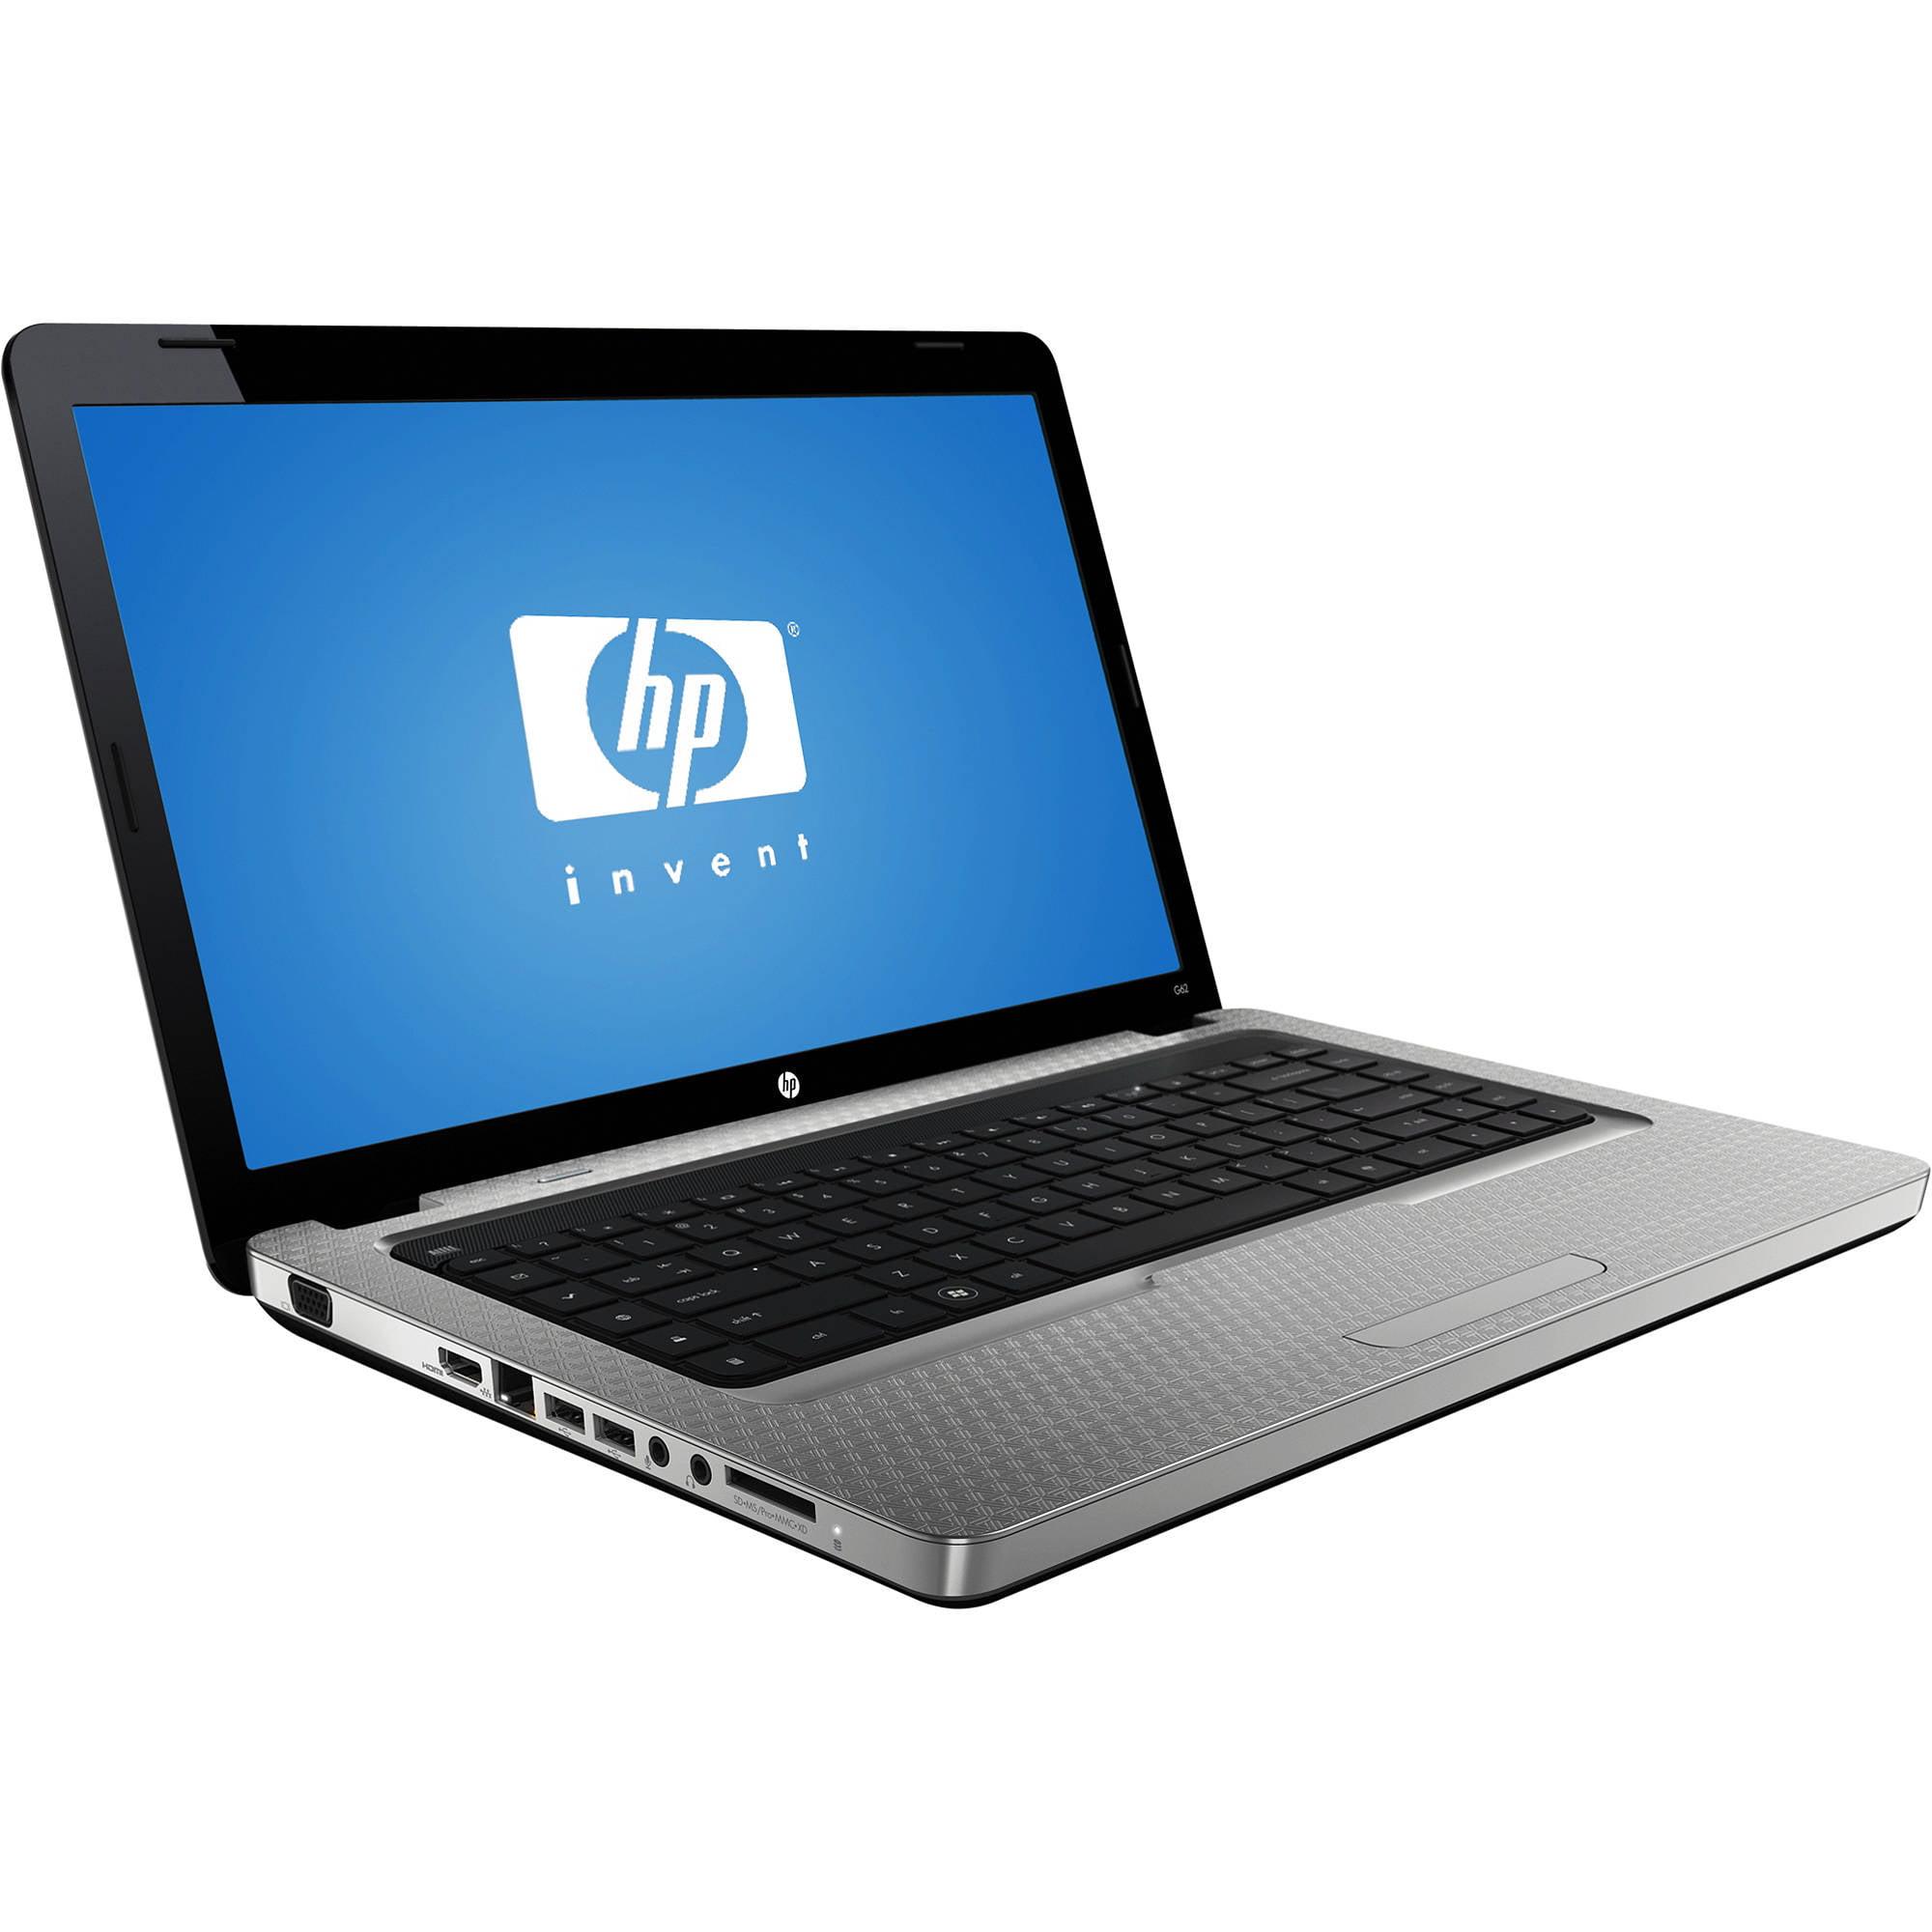 HP G62-100EE Notebook Quick Launch Buttons Update